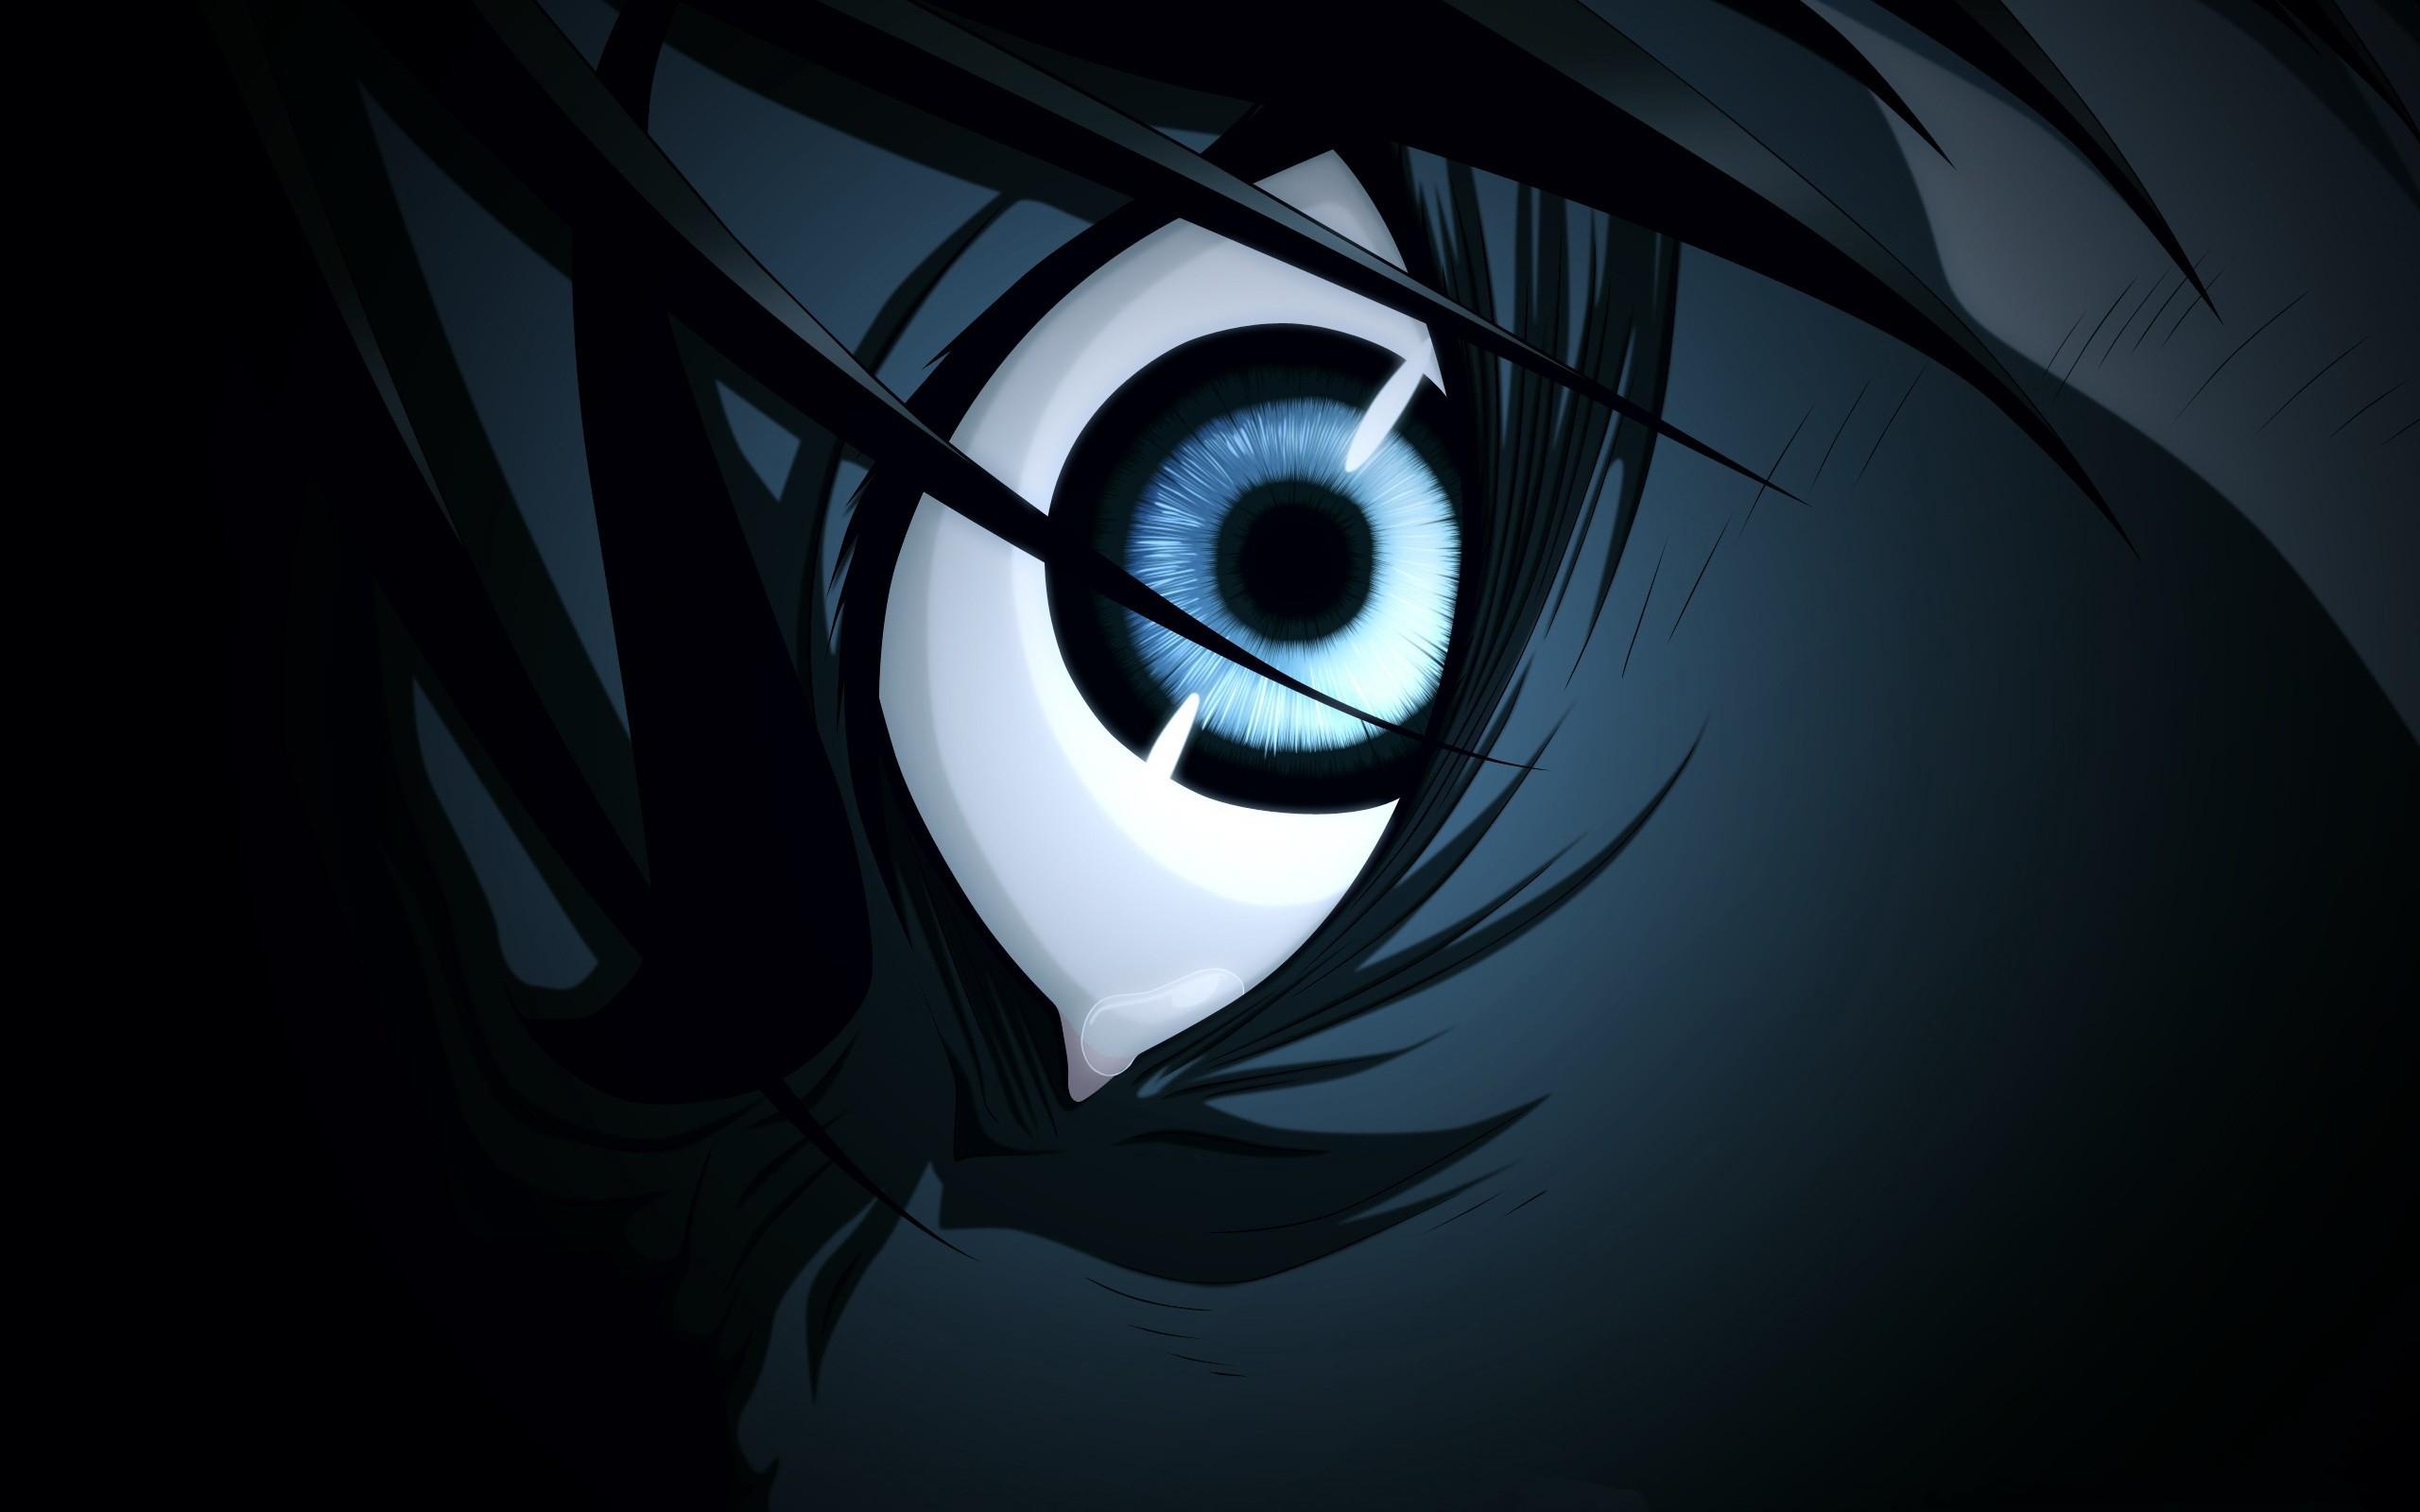 Wallpaper Illustration Anime Shingeki No Kyojin Circle Eren Jeager Darkness Screenshot Computer Wallpaper Black And White Monochrome Photography 2560x1600 Mattilius258 132374 Hd Wallpapers Wallhere